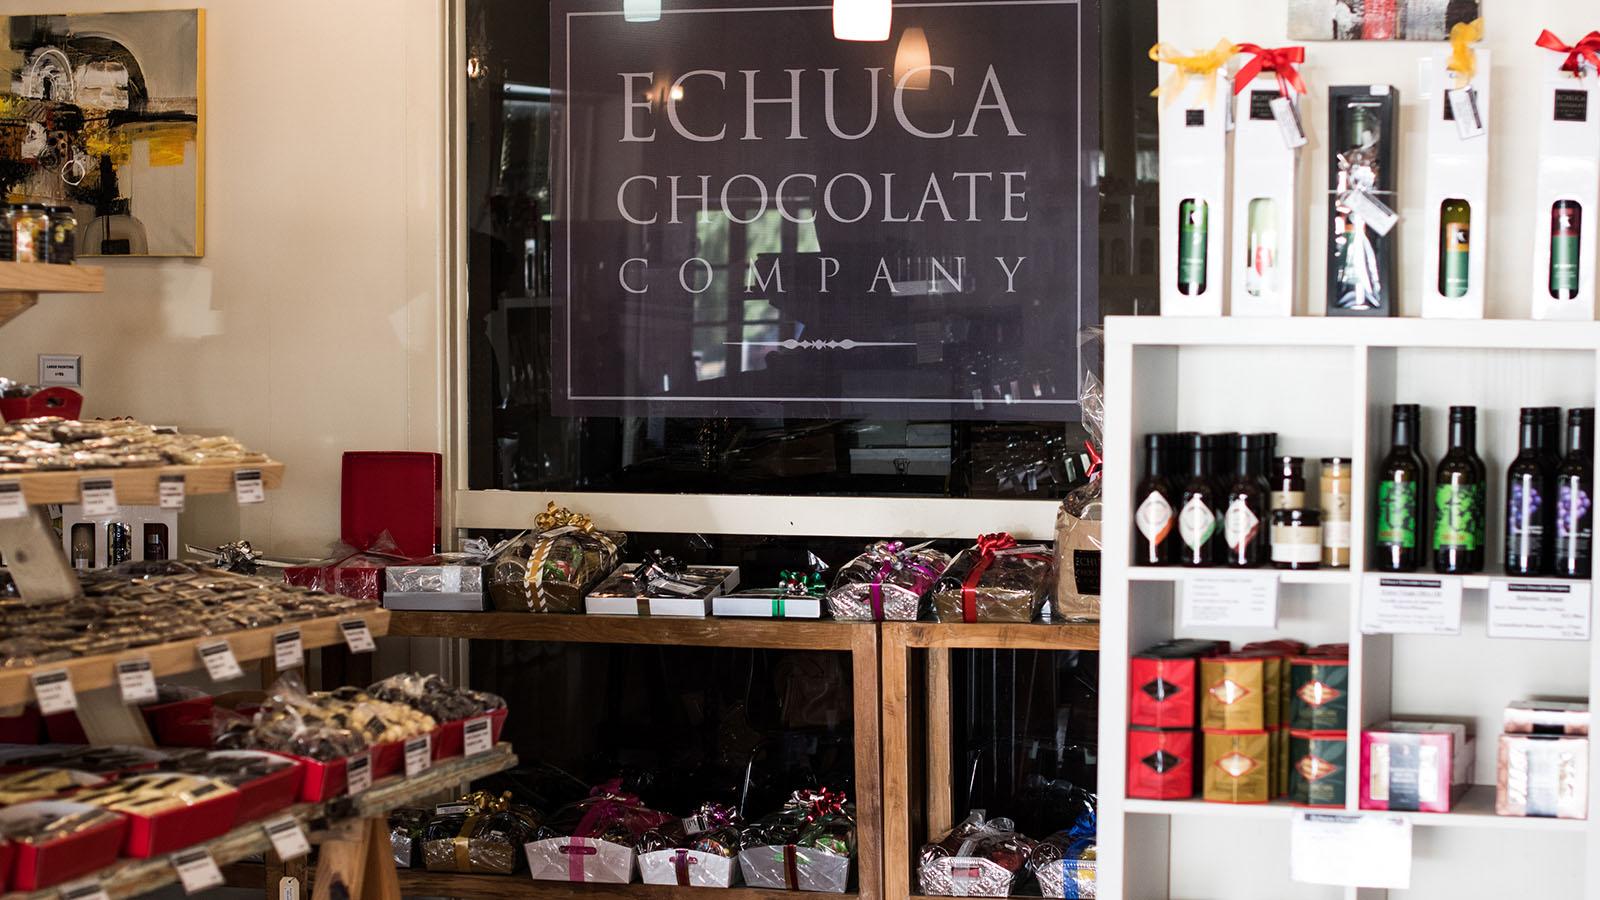 Echuca Chocolate Company, The Murray, Victoria, Australia